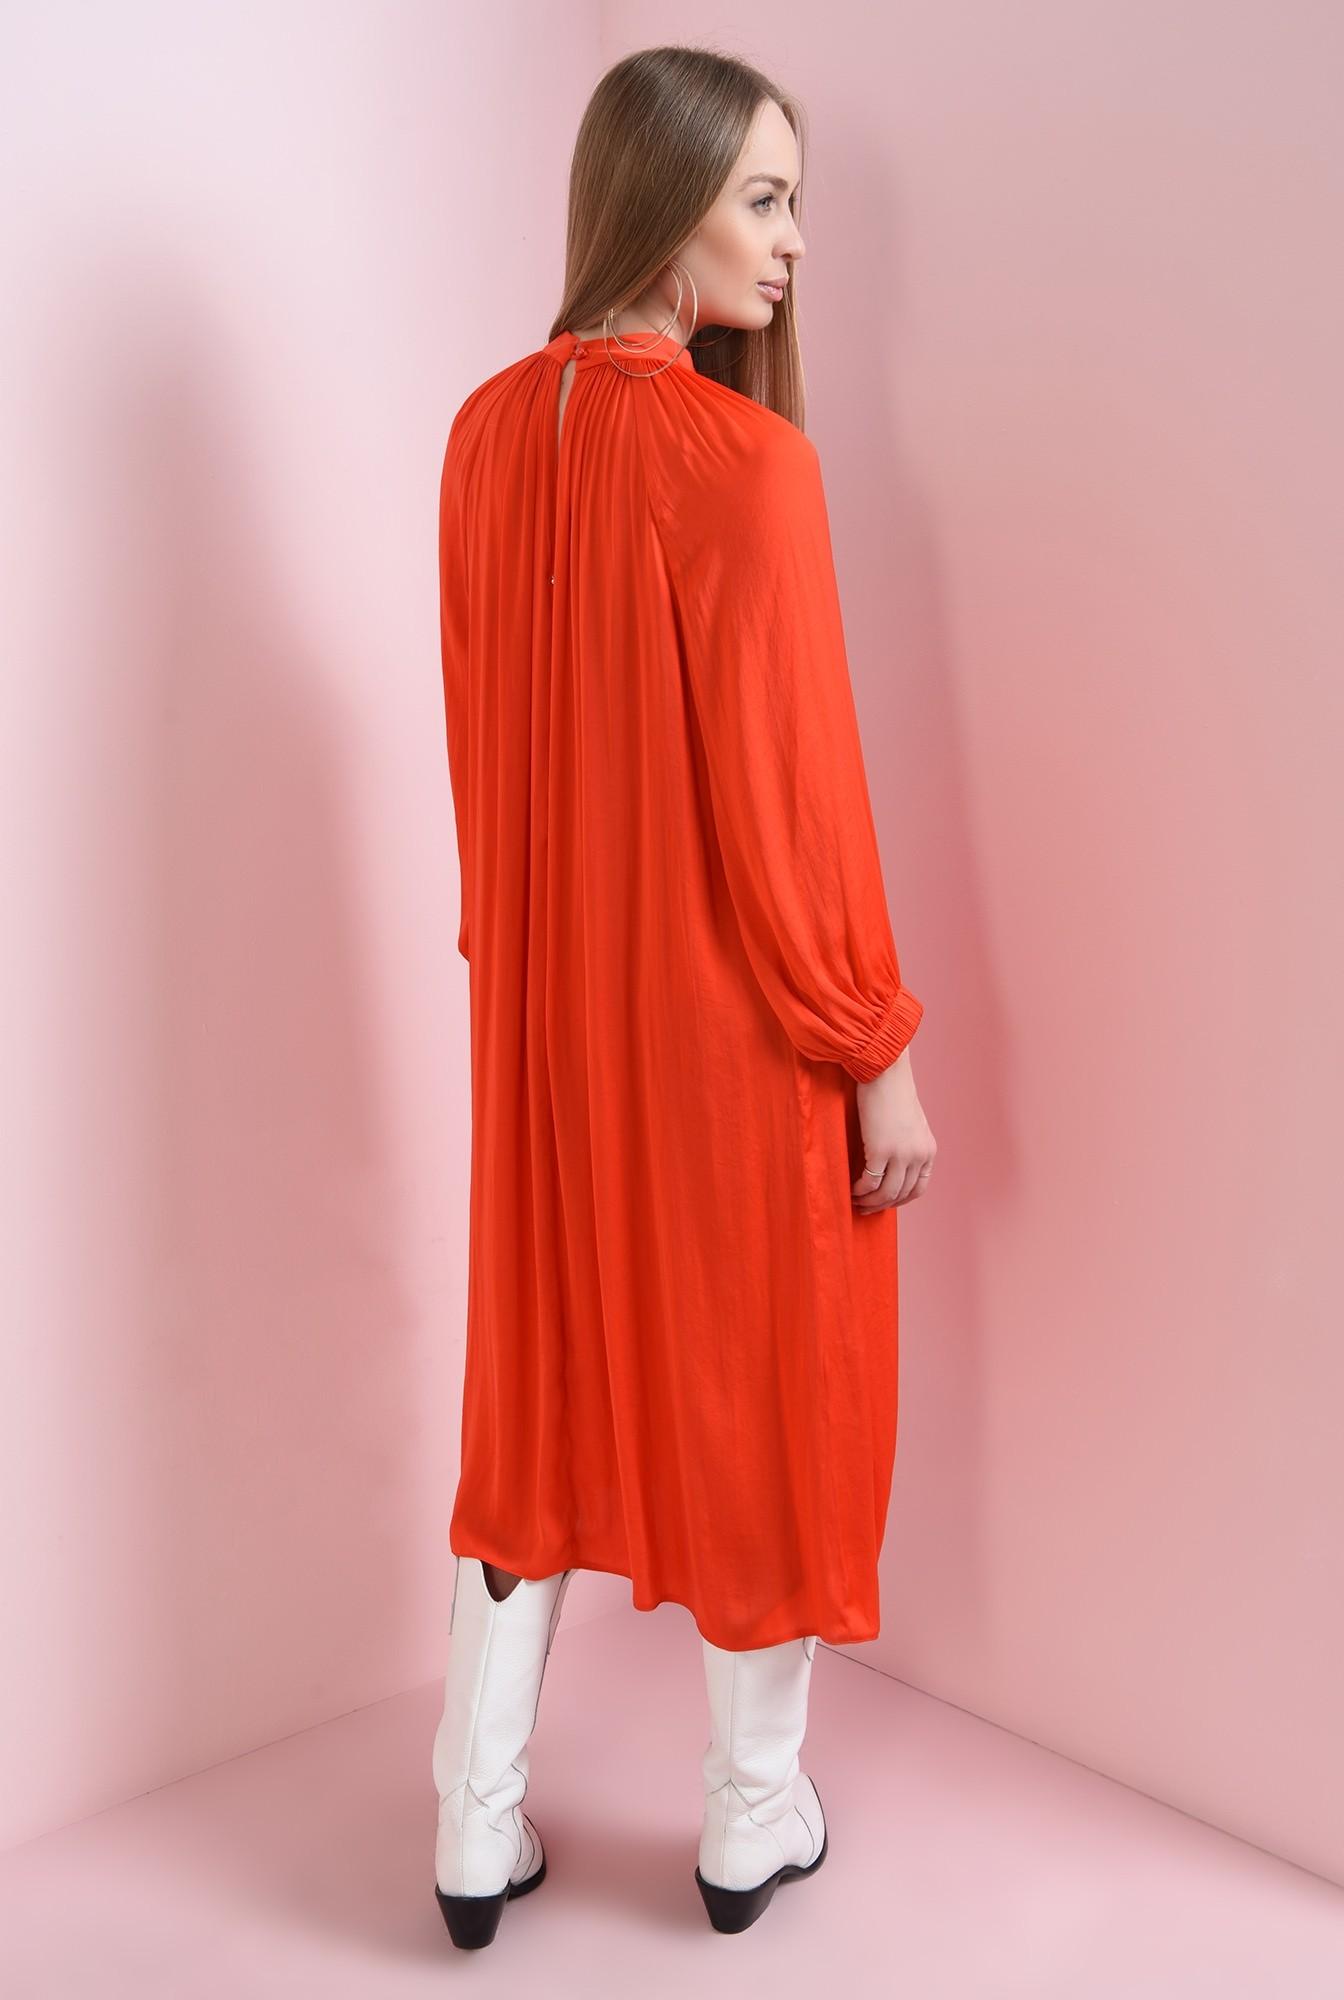 1 - rochie din satin, cu maneca voluminoasa